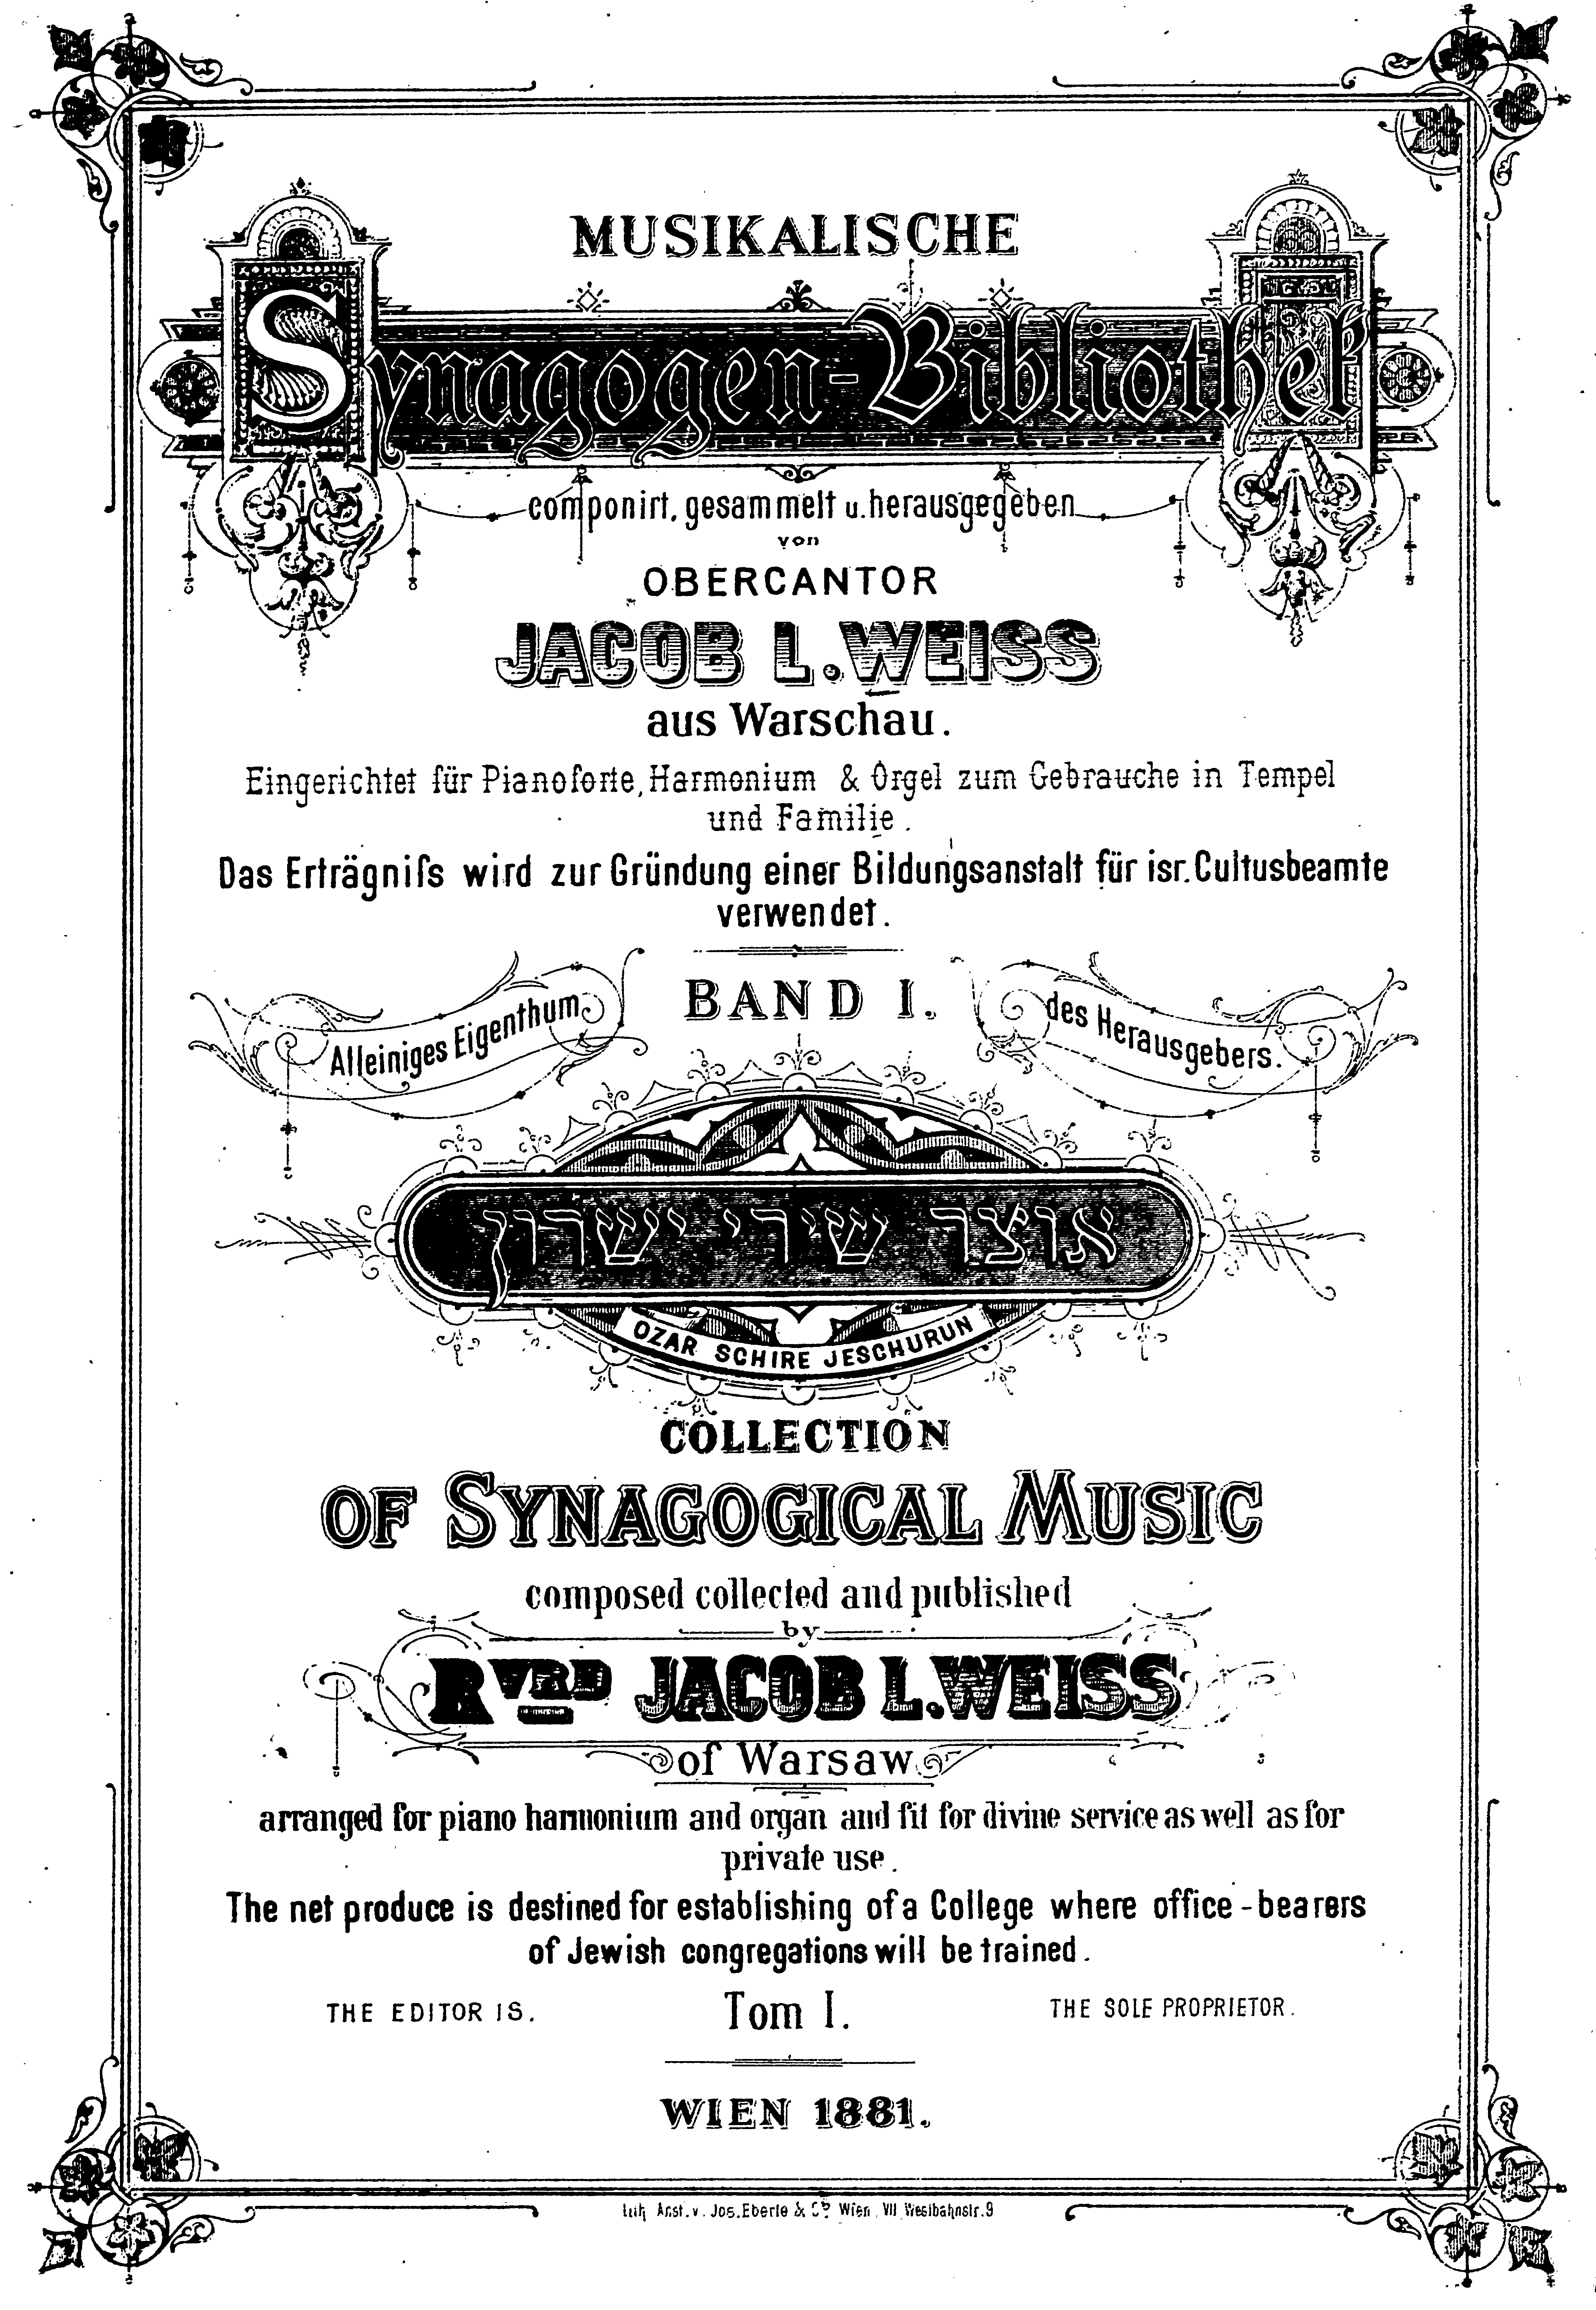 Ilustracja 5. JCS Universitätsbibliothek Frankfurt a.M. /Freimann Collection: strona tytułowa, Jakub L. Weiss, <i>Musikalische Synagogen-Bibliothek: Ozar Schire Jeschurun</i>, t. 1, Eberle, Wiedeń 1881, sygn. 227528921